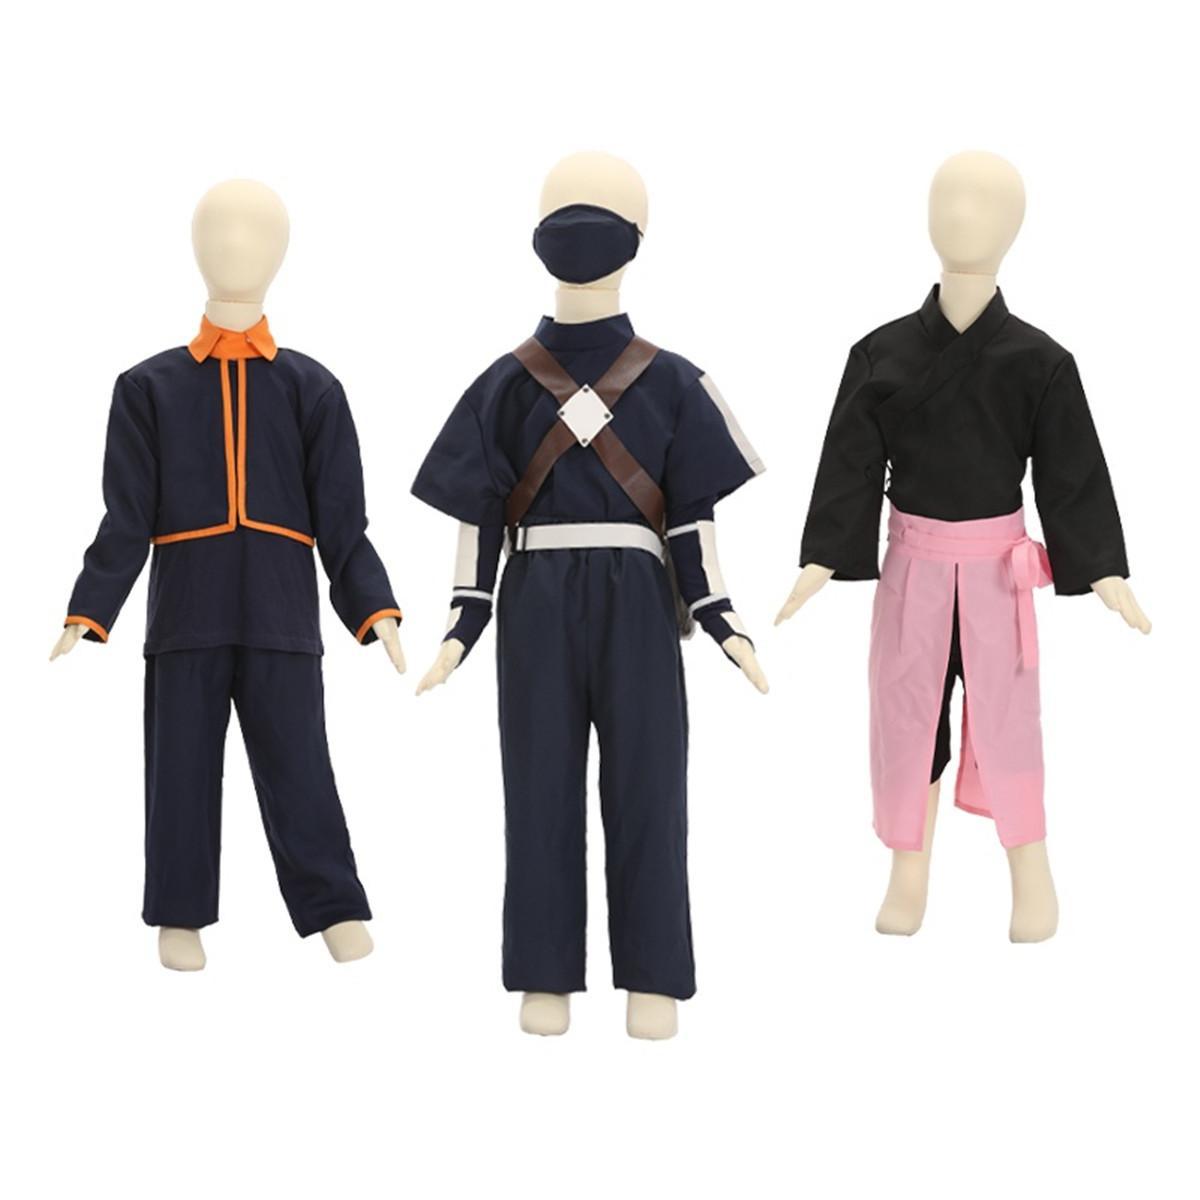 2020 Unisex Cadılar Bayramı Çocuklar Naruto Japonya Anime Uchiha Obito Üniforma Hatake Kakashi Cosplay Kostüm Takım